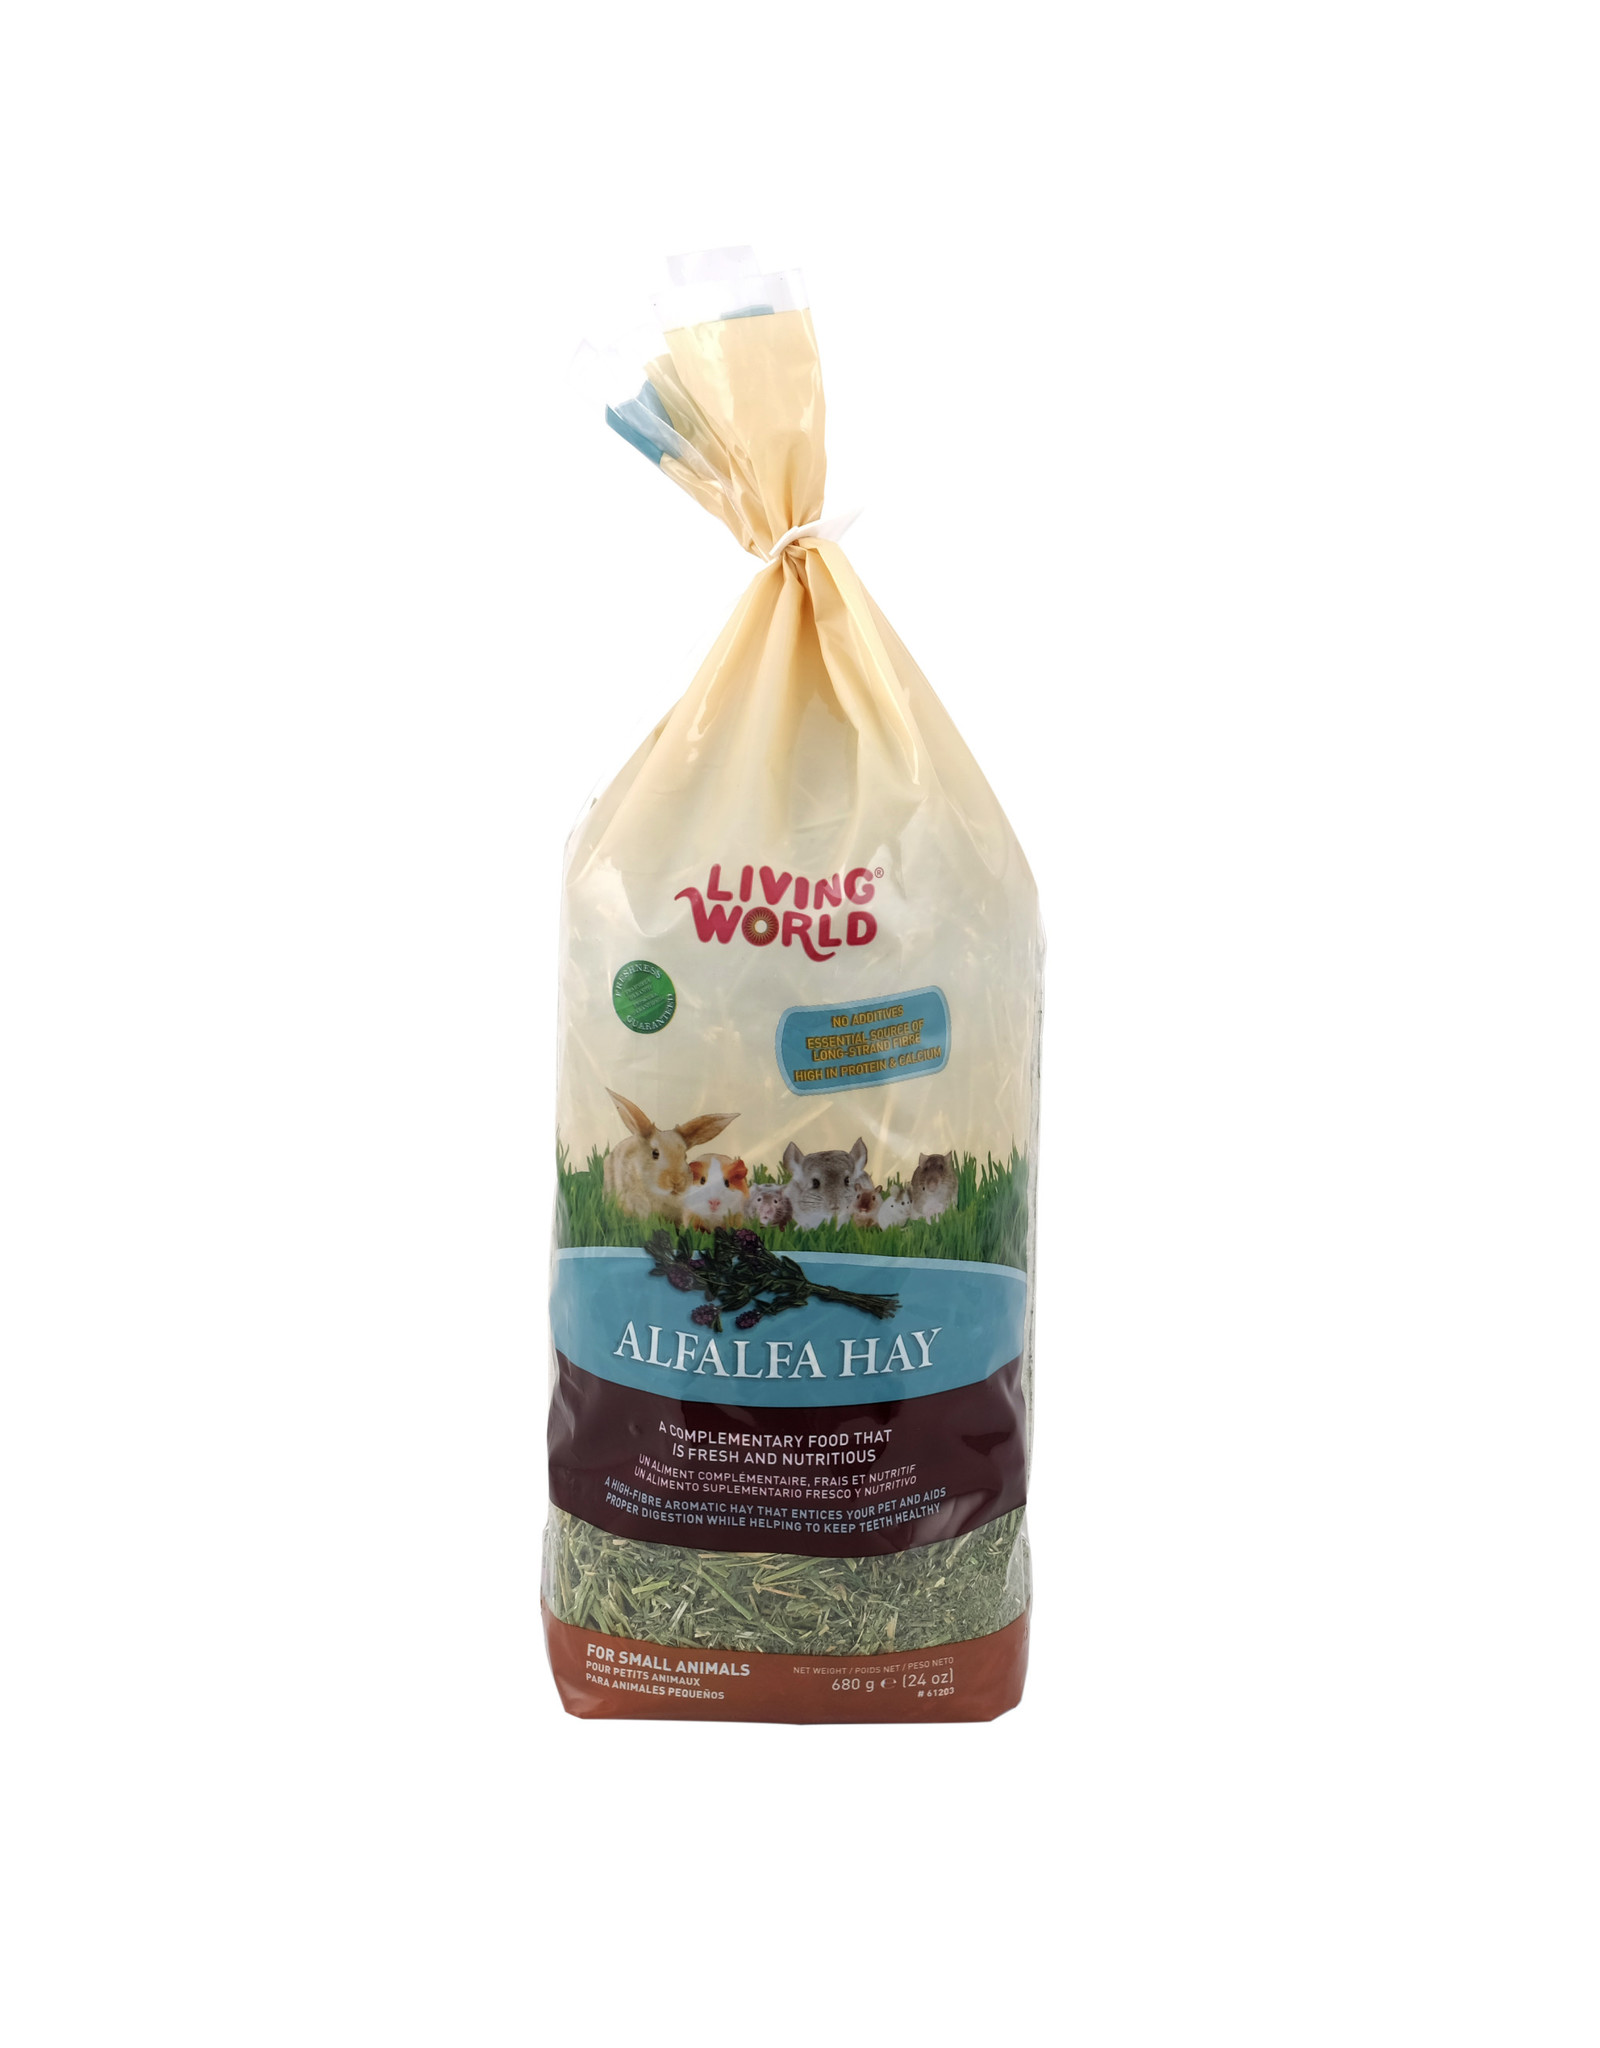 Living World Living World Alfalfa Hay - Large - 680 g (24 oz)